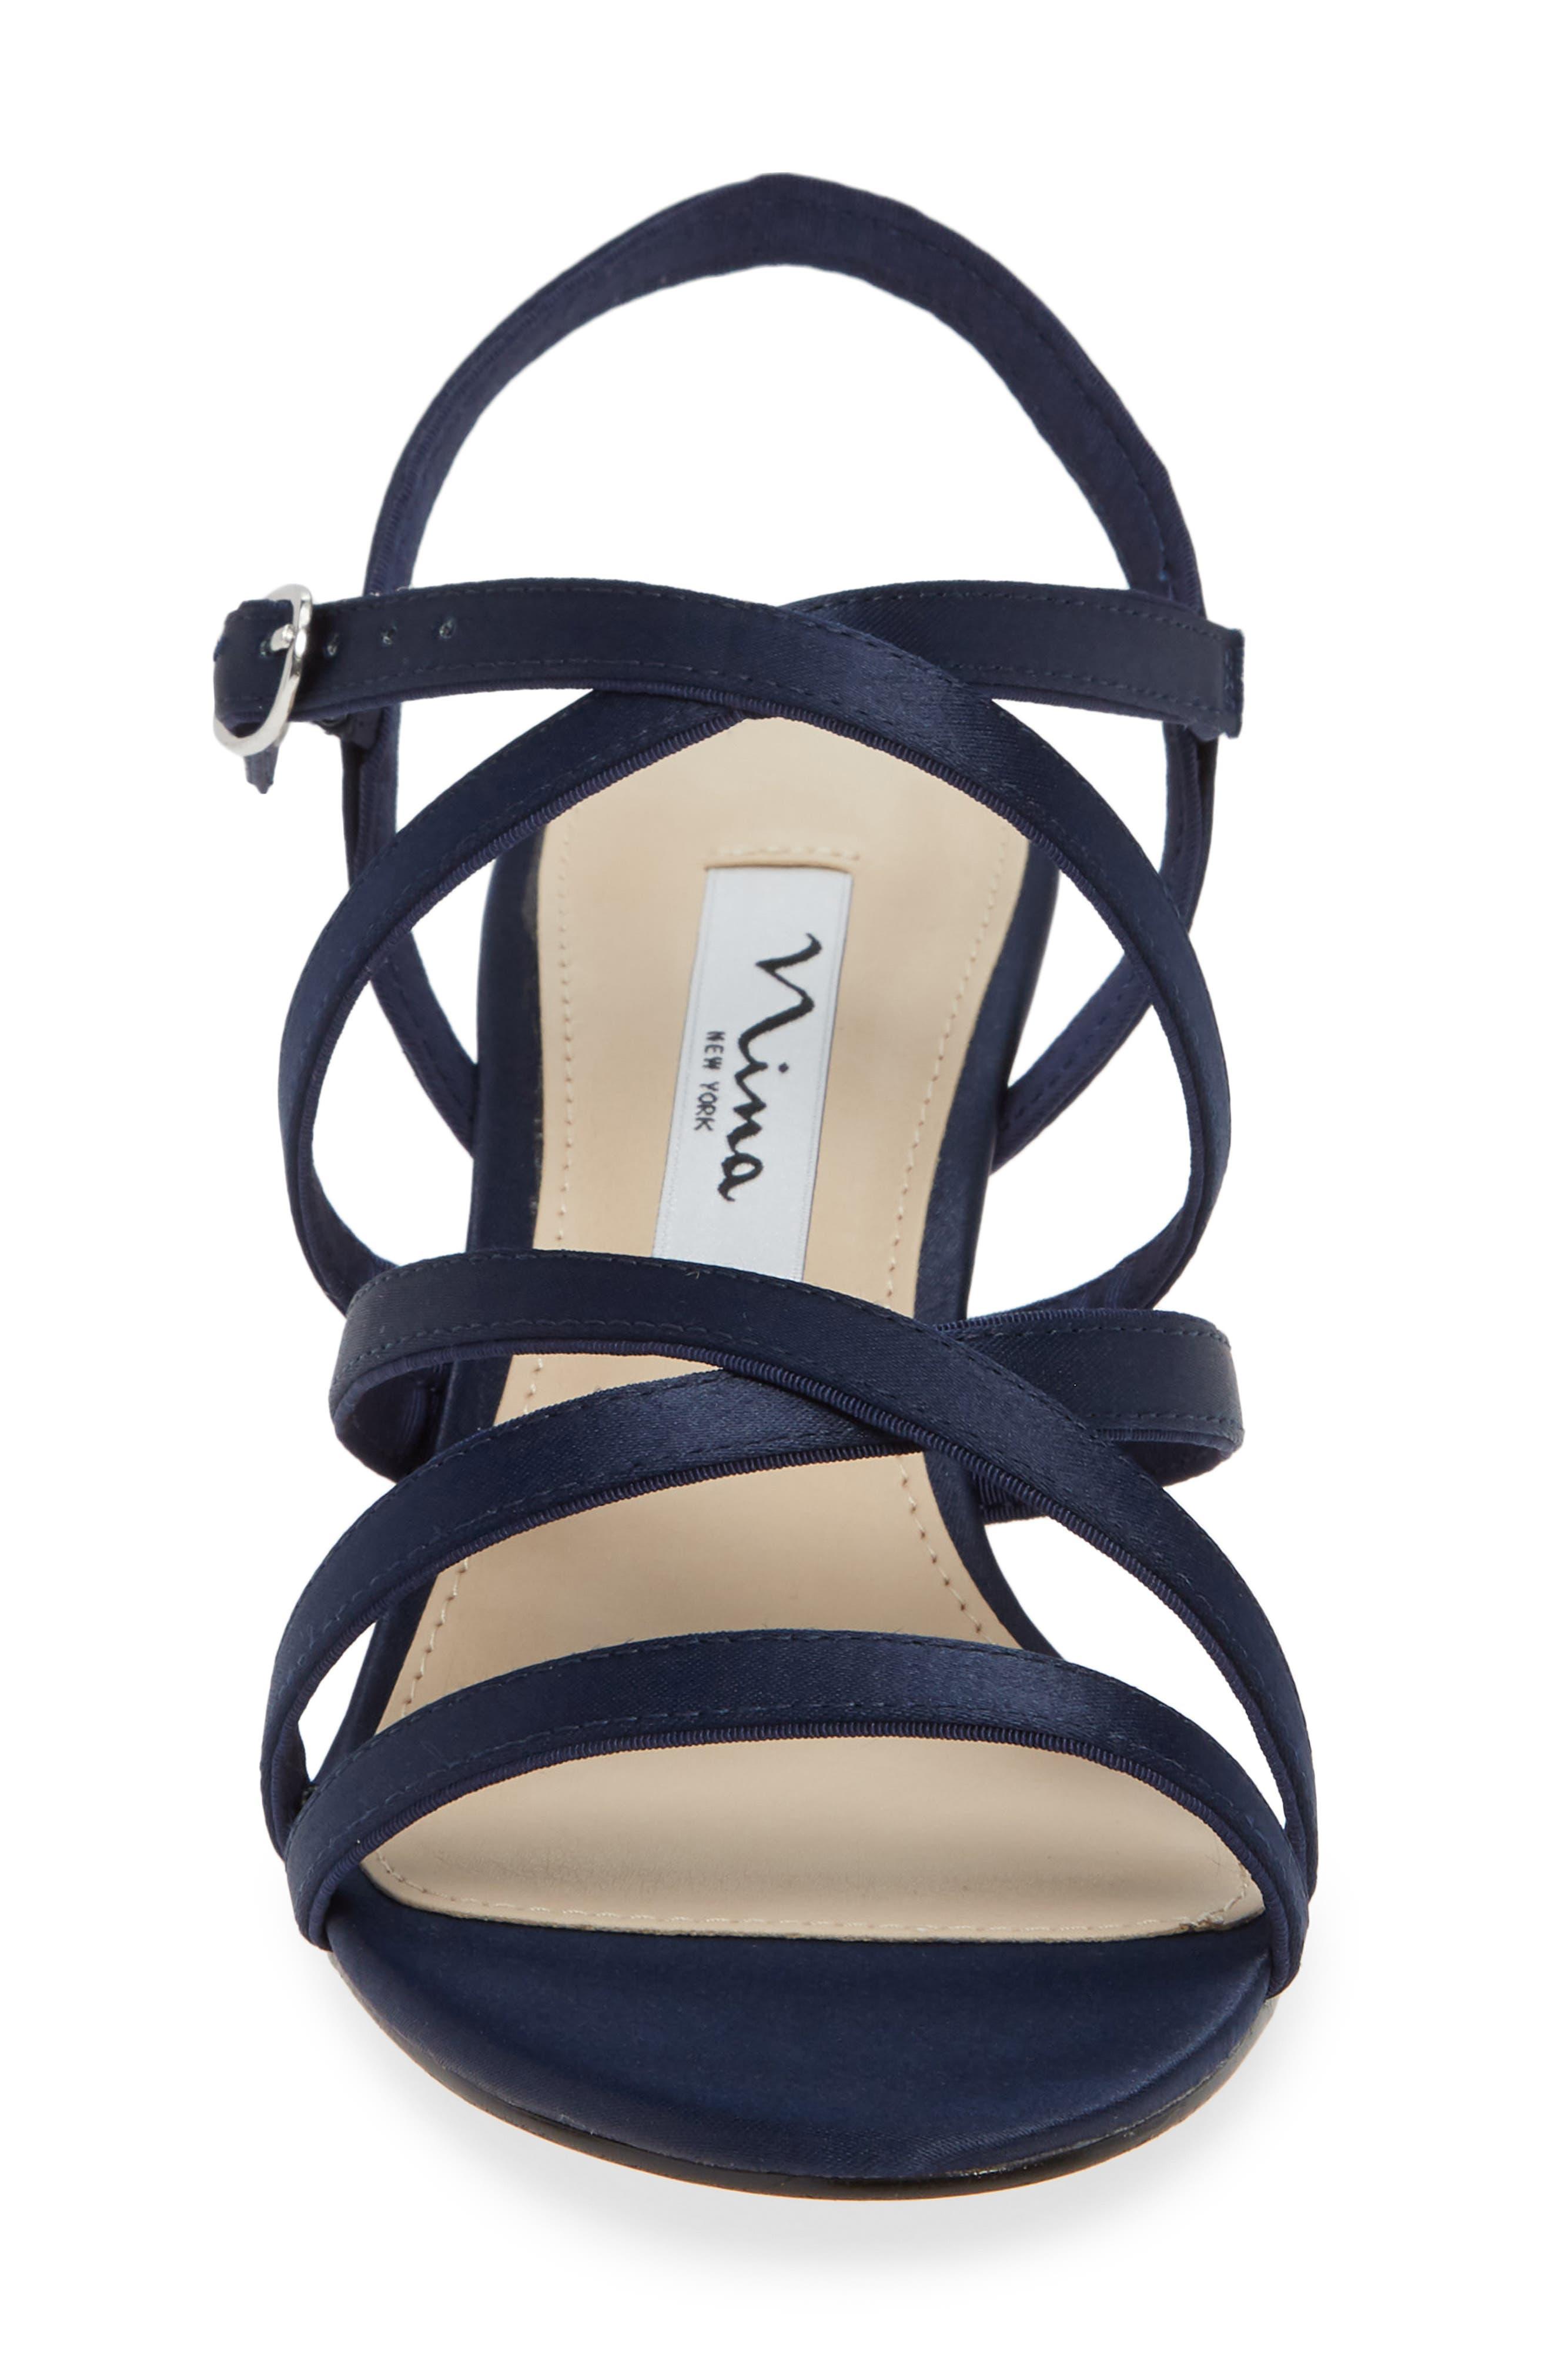 Genaya Strappy Evening Sandal,                             Alternate thumbnail 6, color,                             Navy Satin